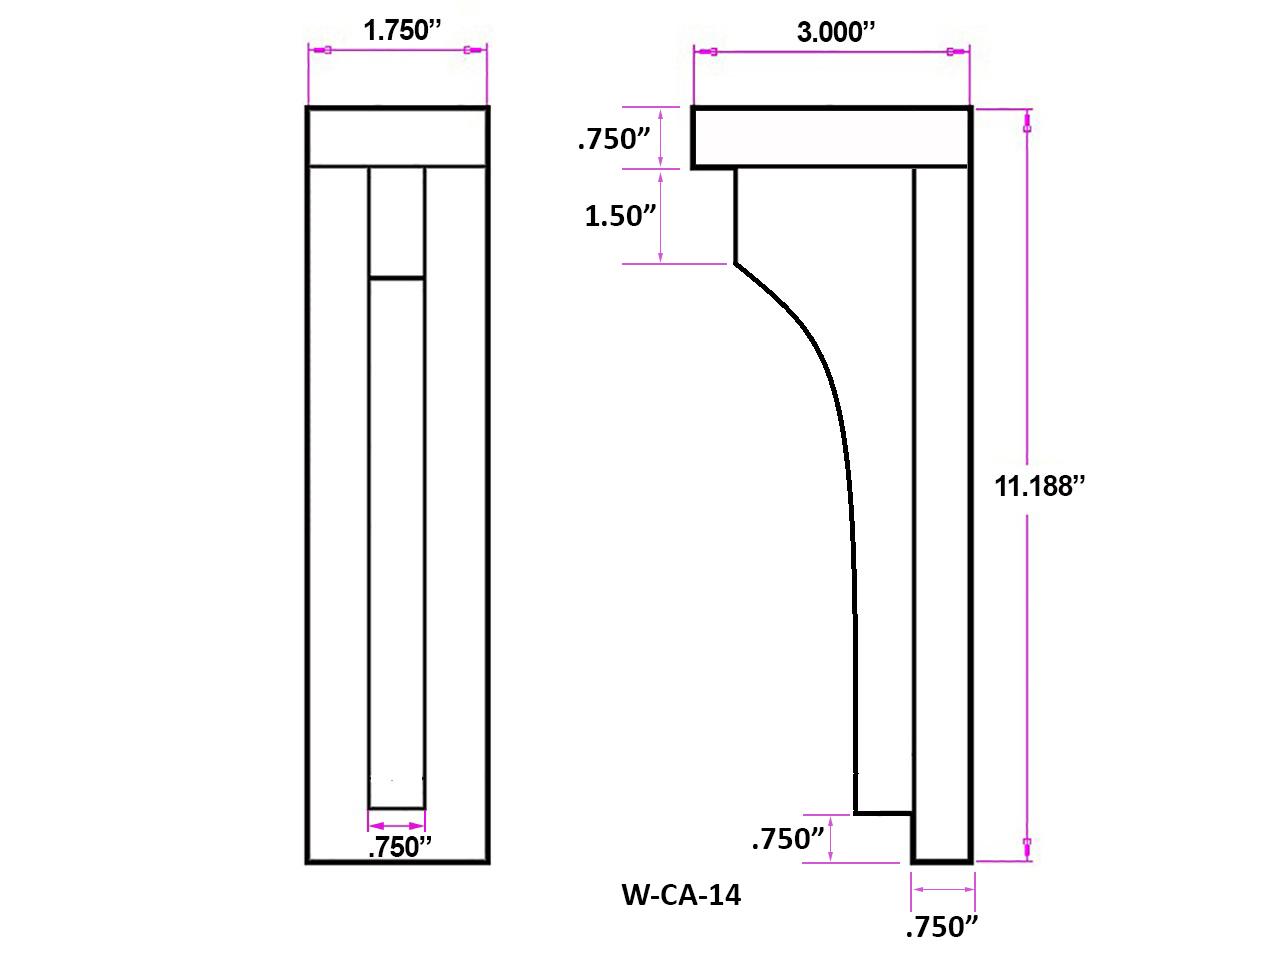 W-CA-14 Linedrawing